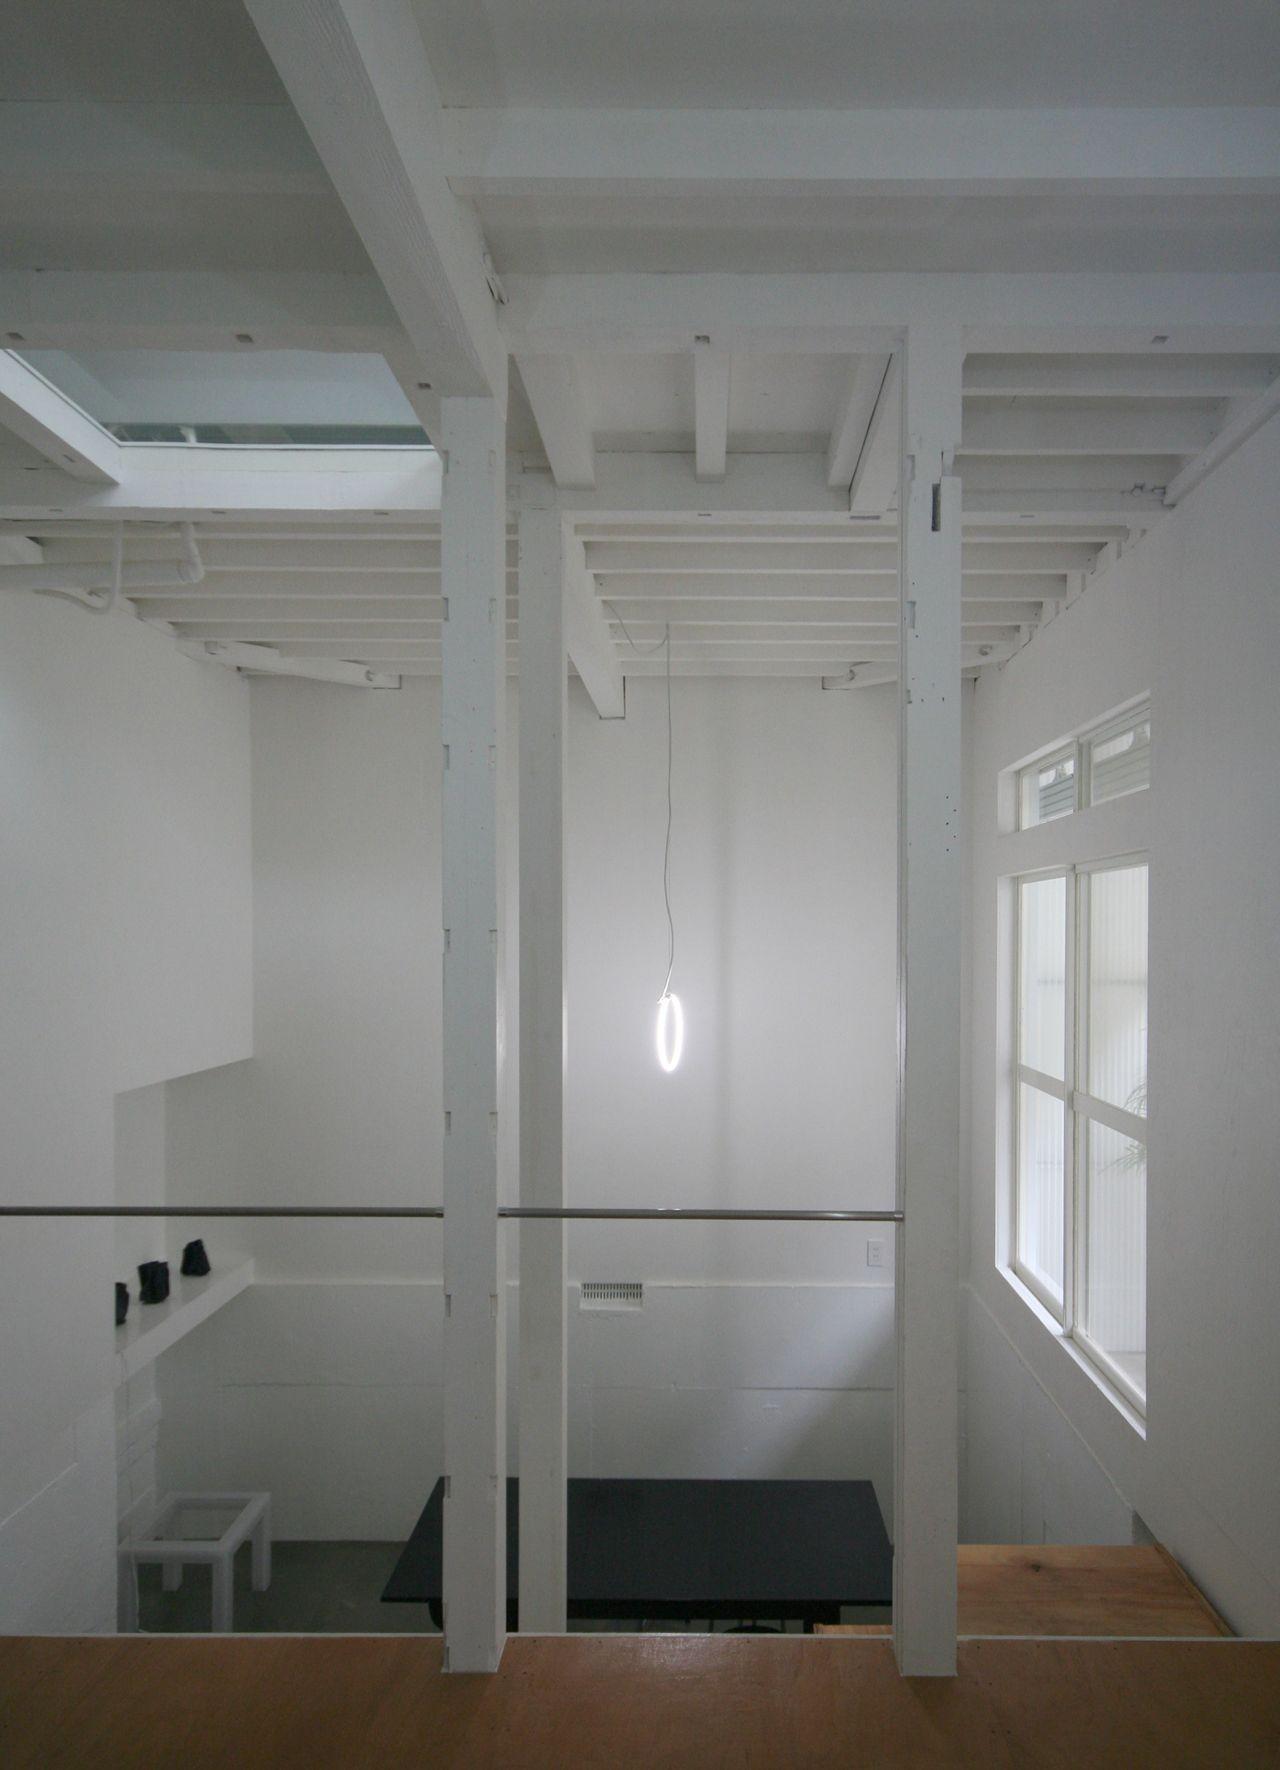 KCH / Kochi Architect's Studio